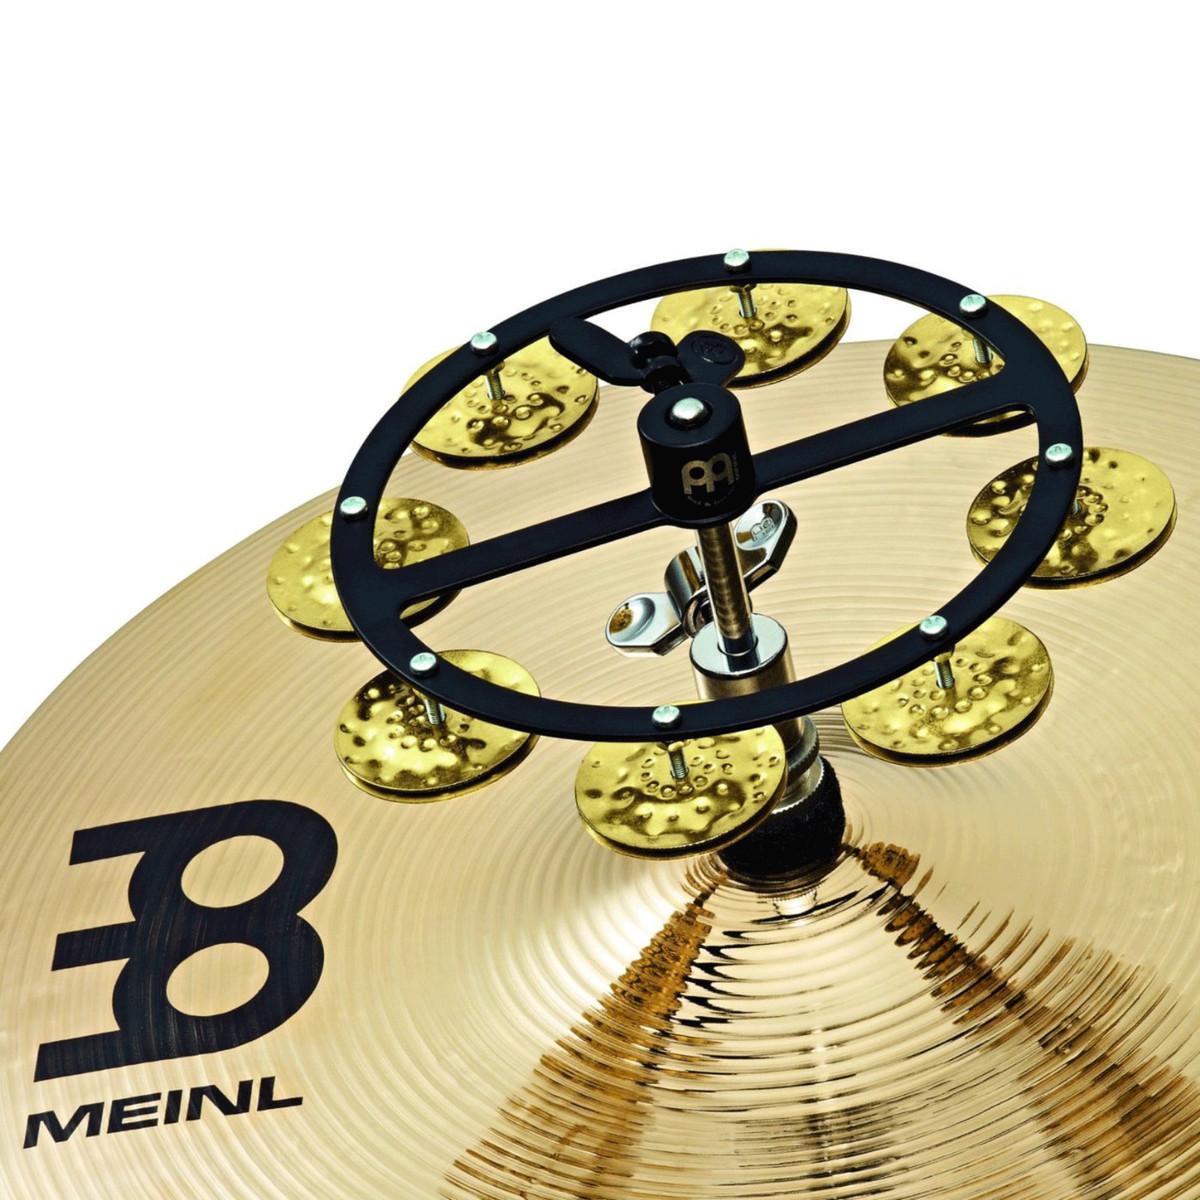 meinl headliner series hi hat tambourine 1 row brass jingles at. Black Bedroom Furniture Sets. Home Design Ideas